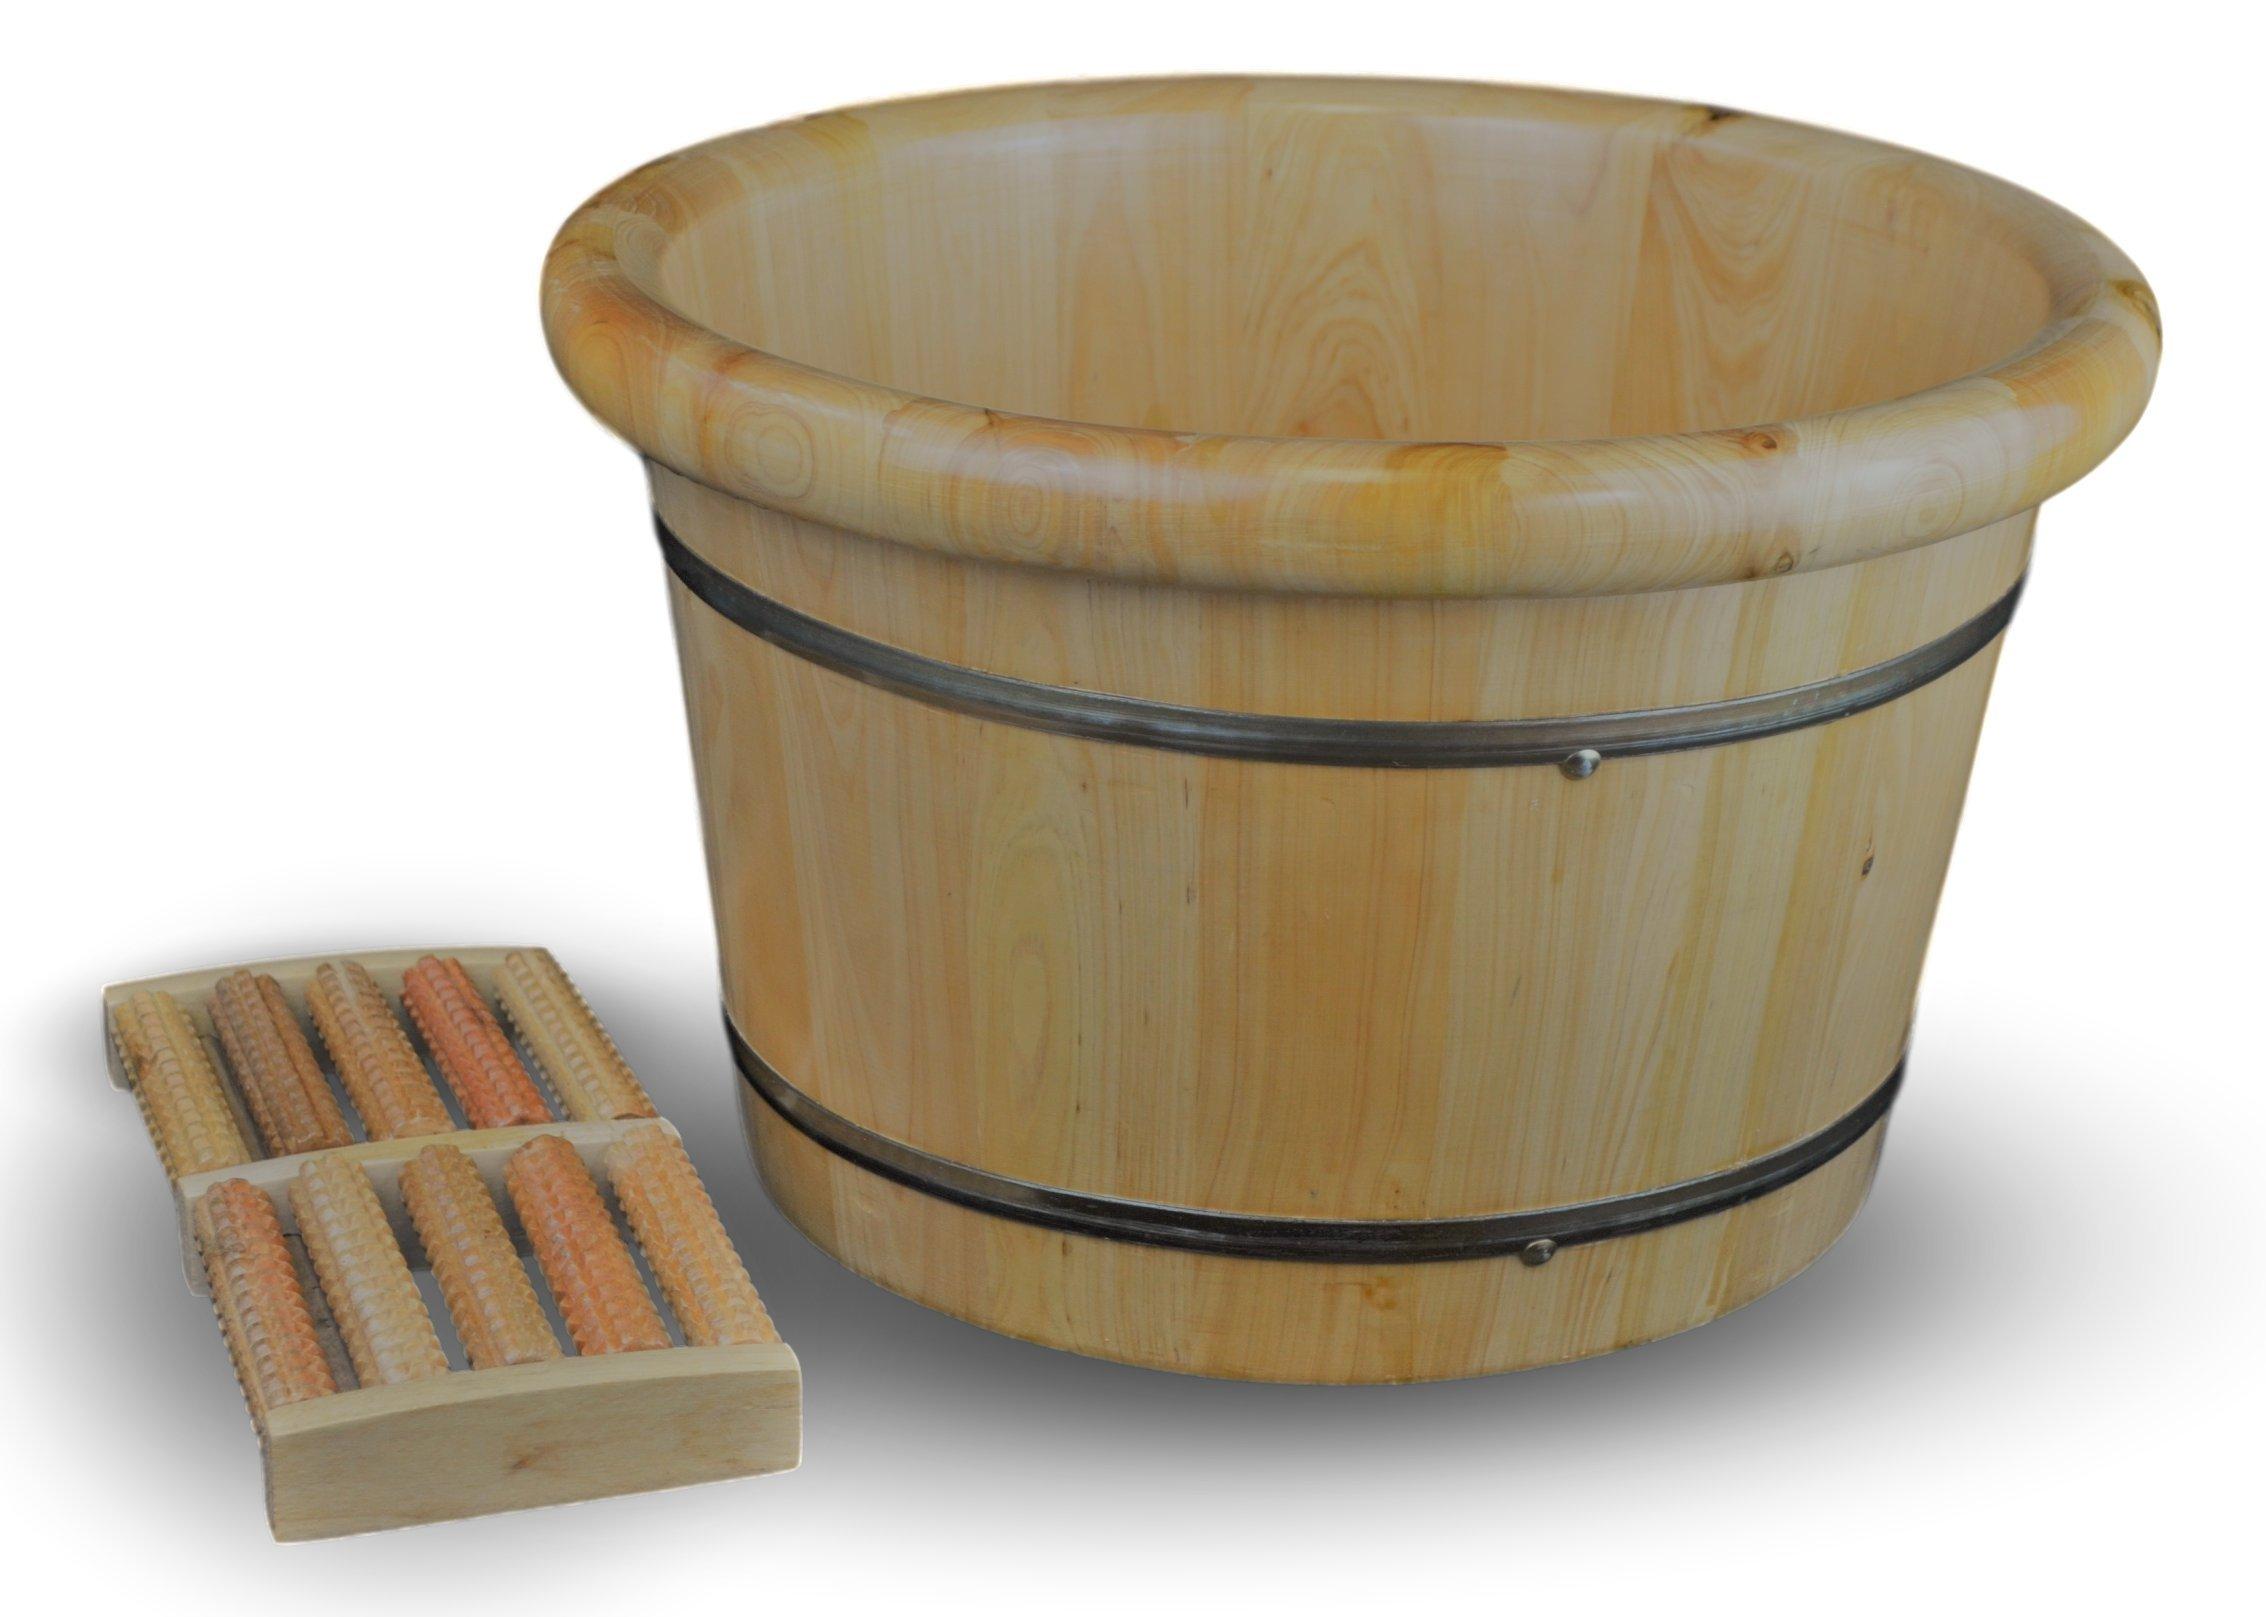 "Festcool 16"" Solid Cedar Wood Foot Basin Tub Bucket for Foot Bath, Soak, Massage, Spa, Sauna, Soak, with Free 5-roll Wooden Massage Roller"